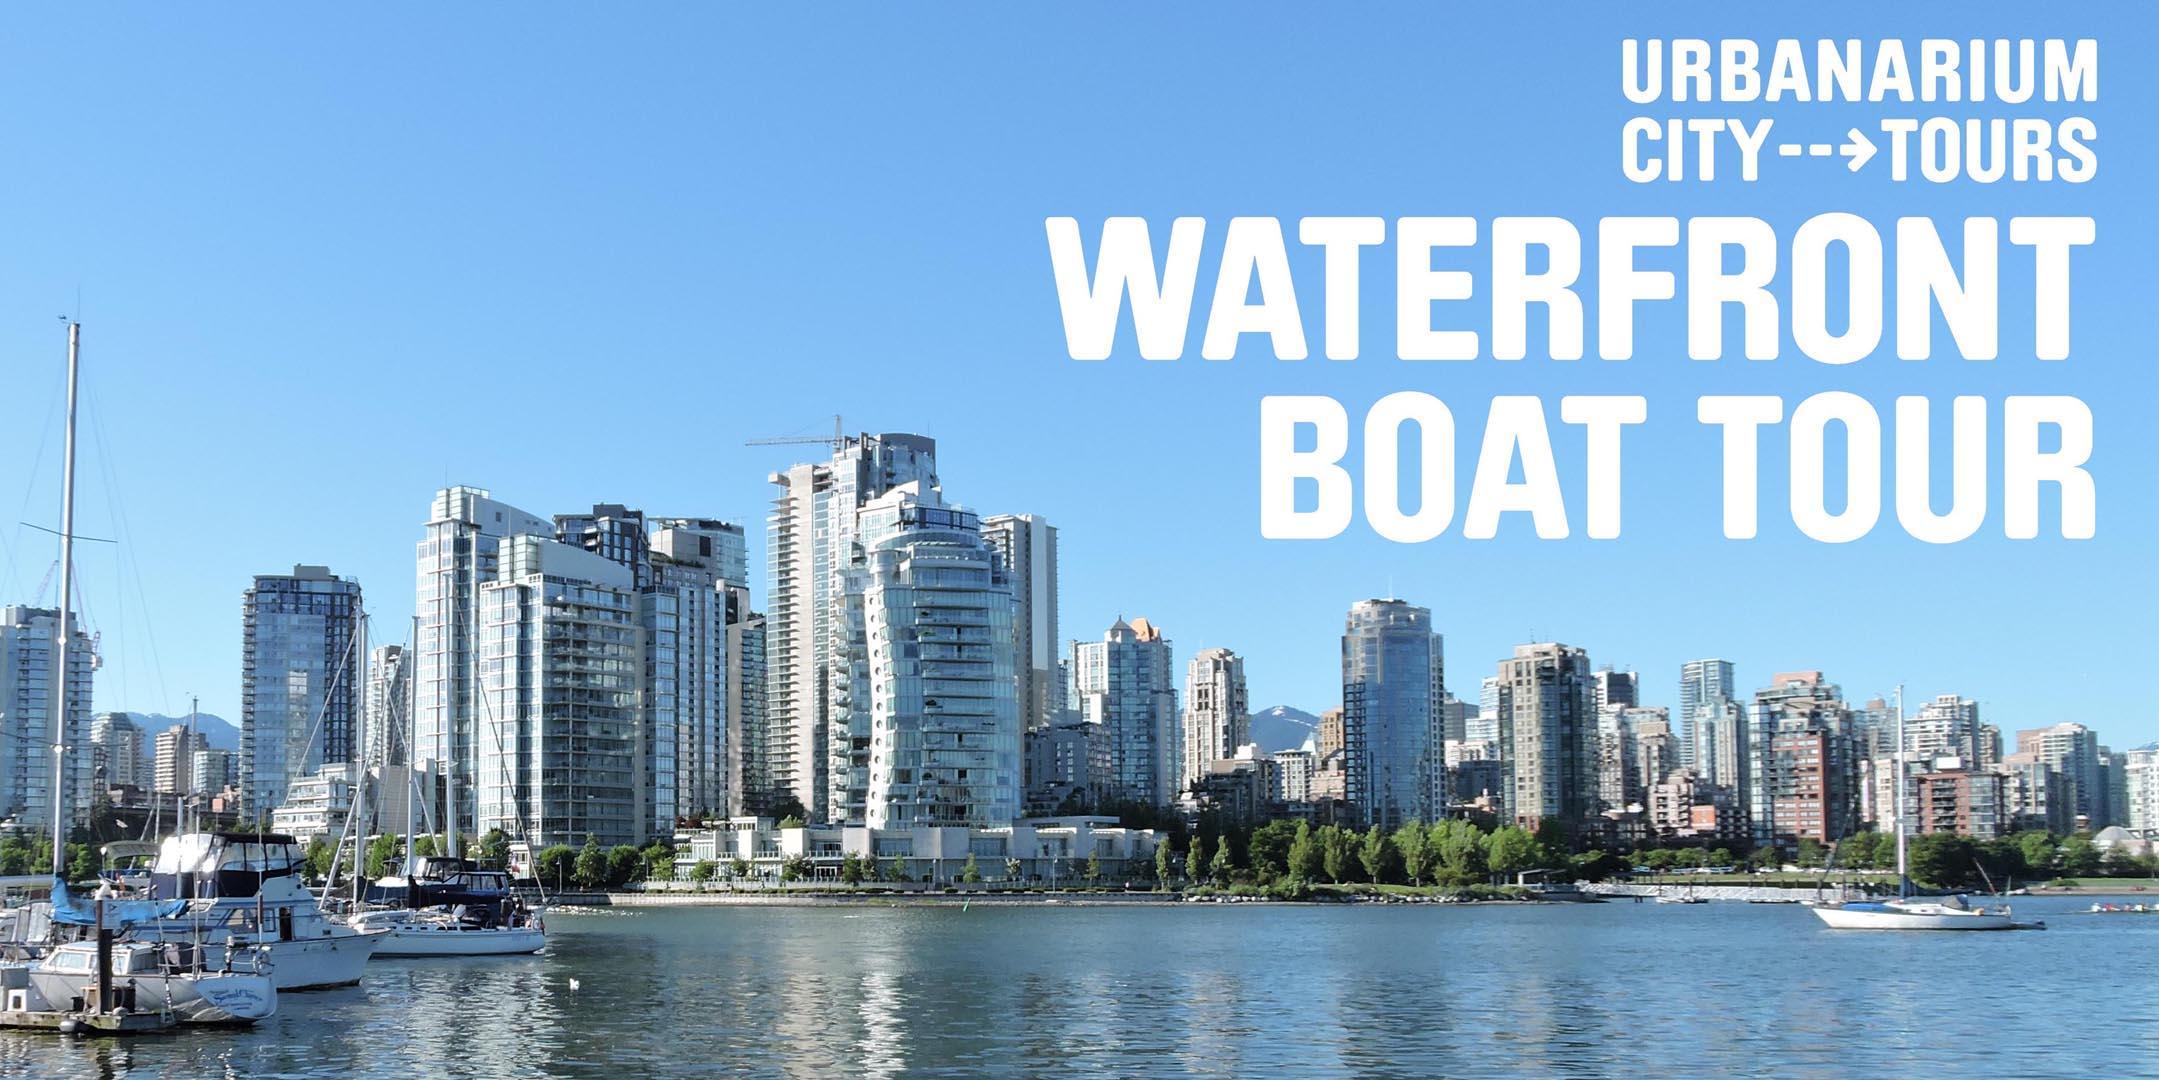 Urbanarium City Tours - Waterfront Boat Tour